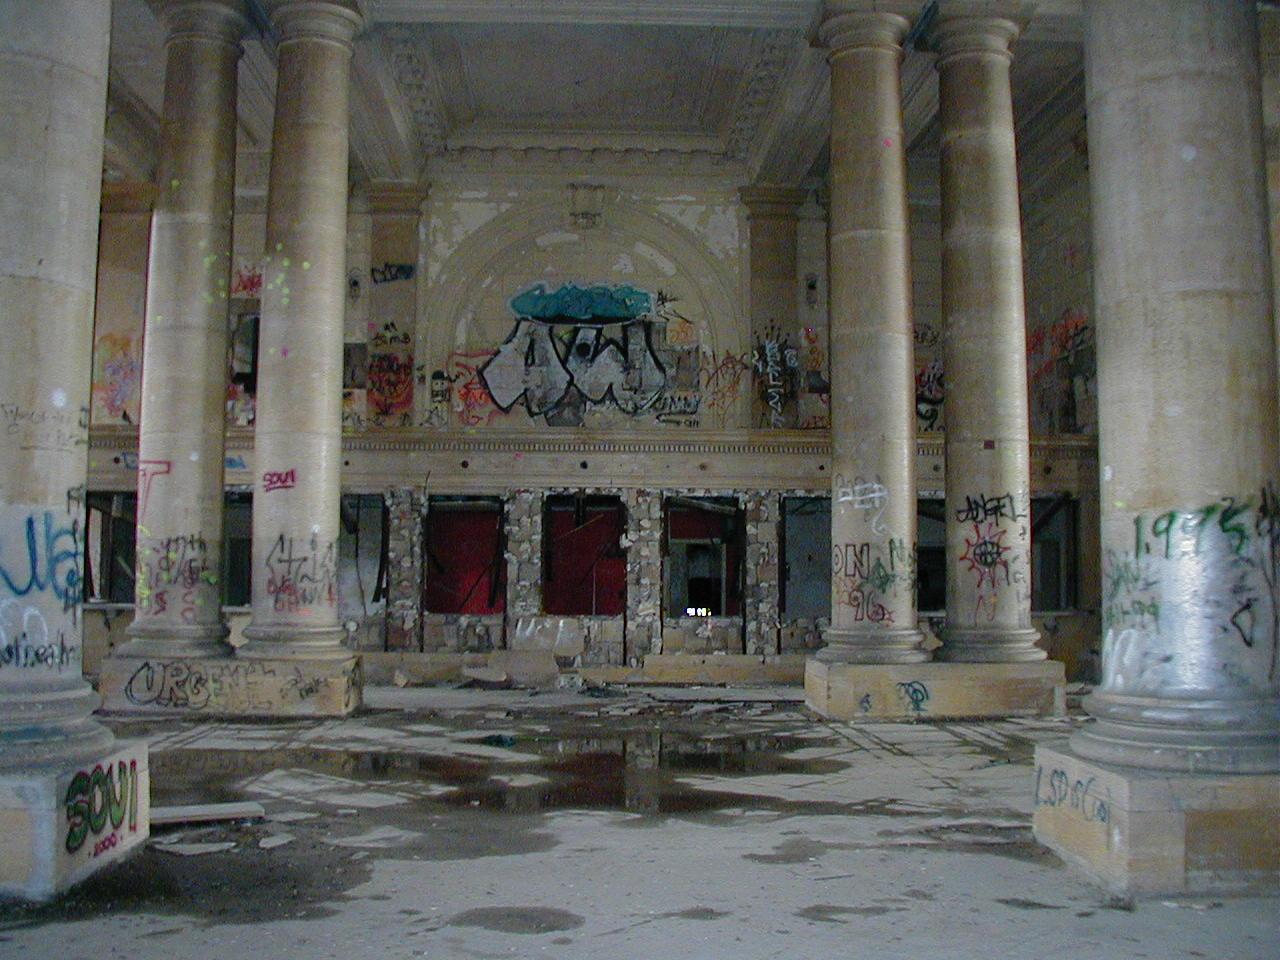 Haunting Images Of Detroit's Decline (PHOTOS)